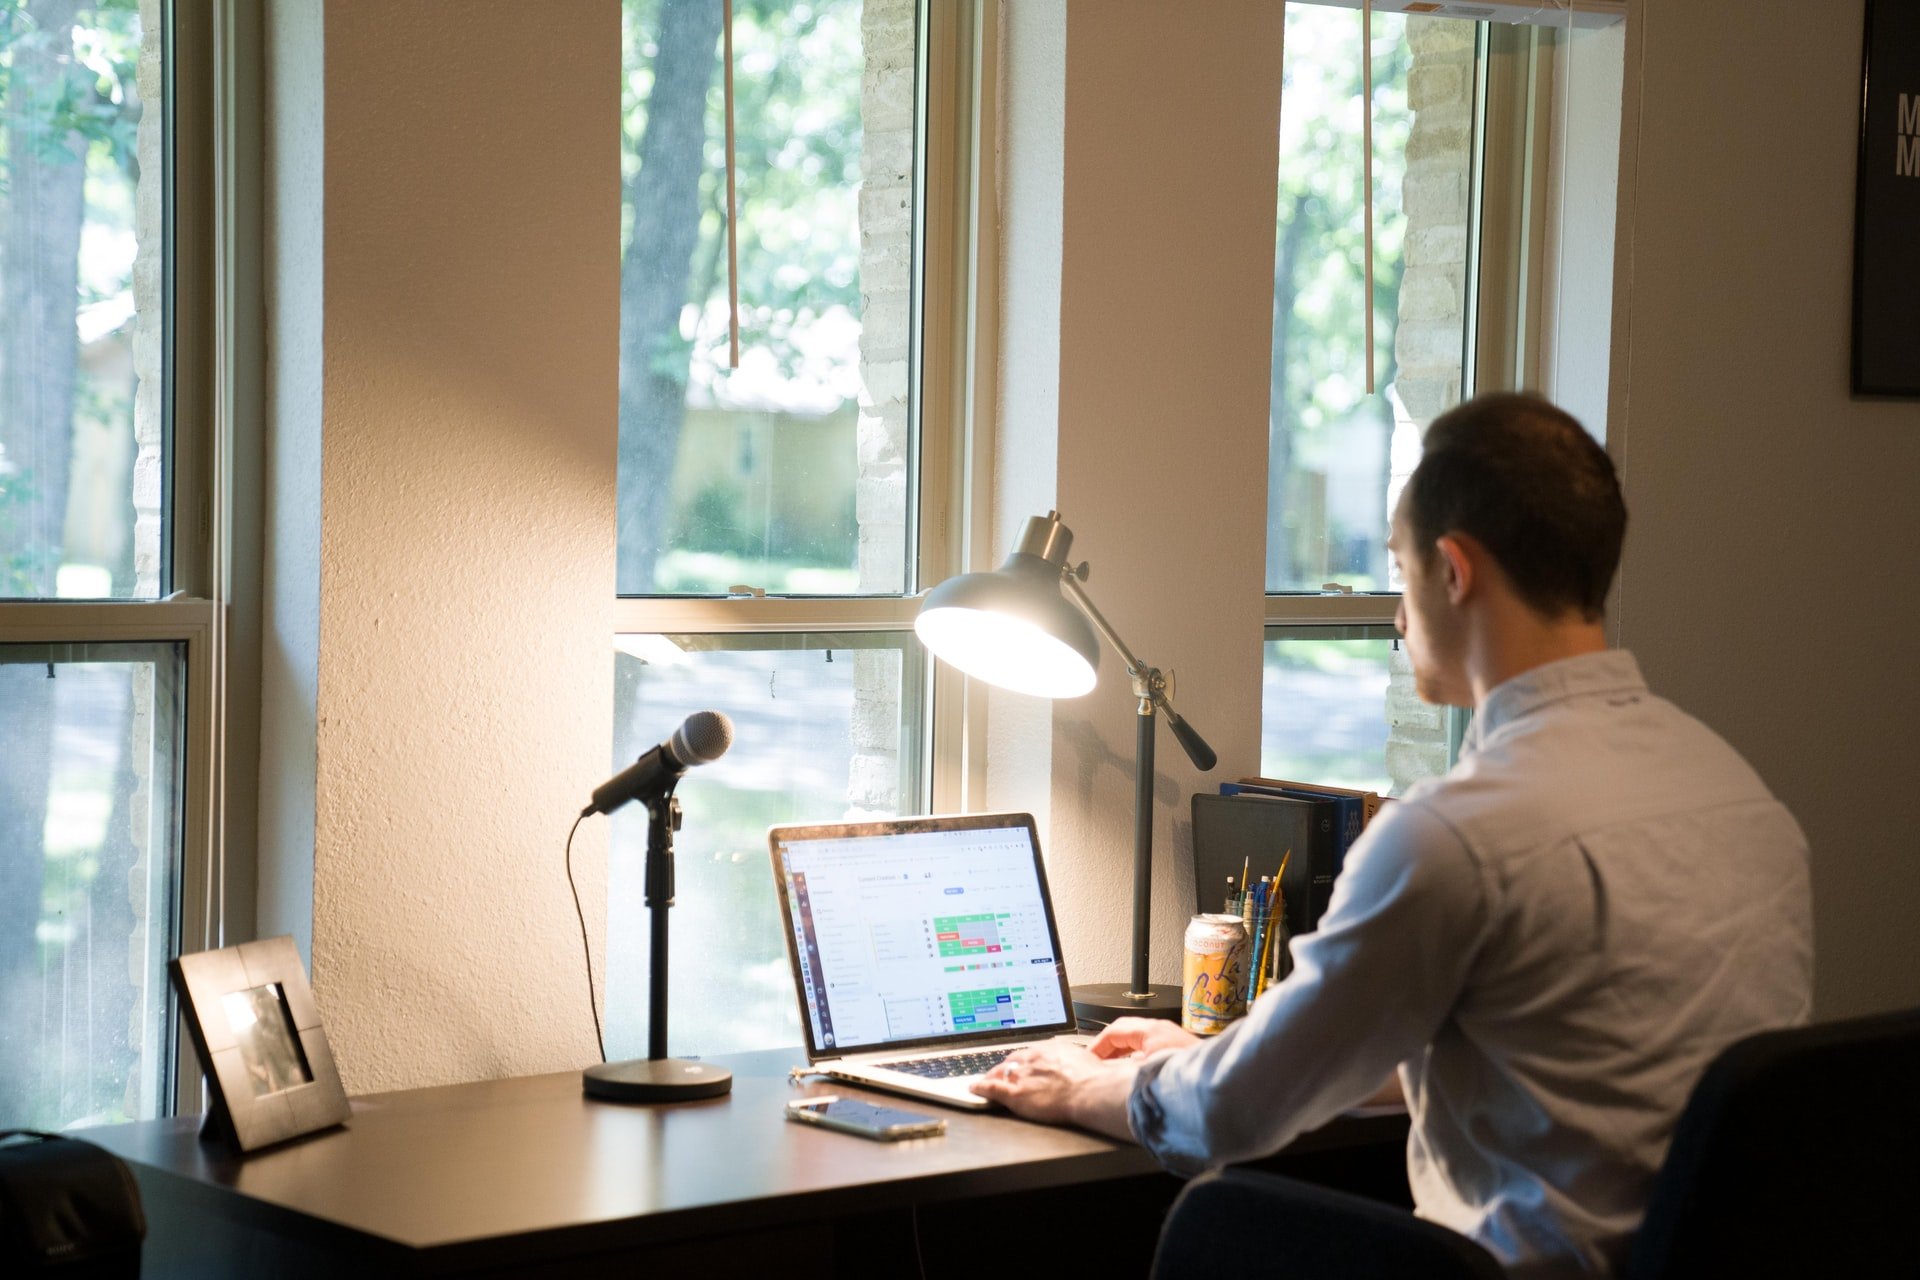 Online Internal Audit: Evaluate Controls, System & Processes